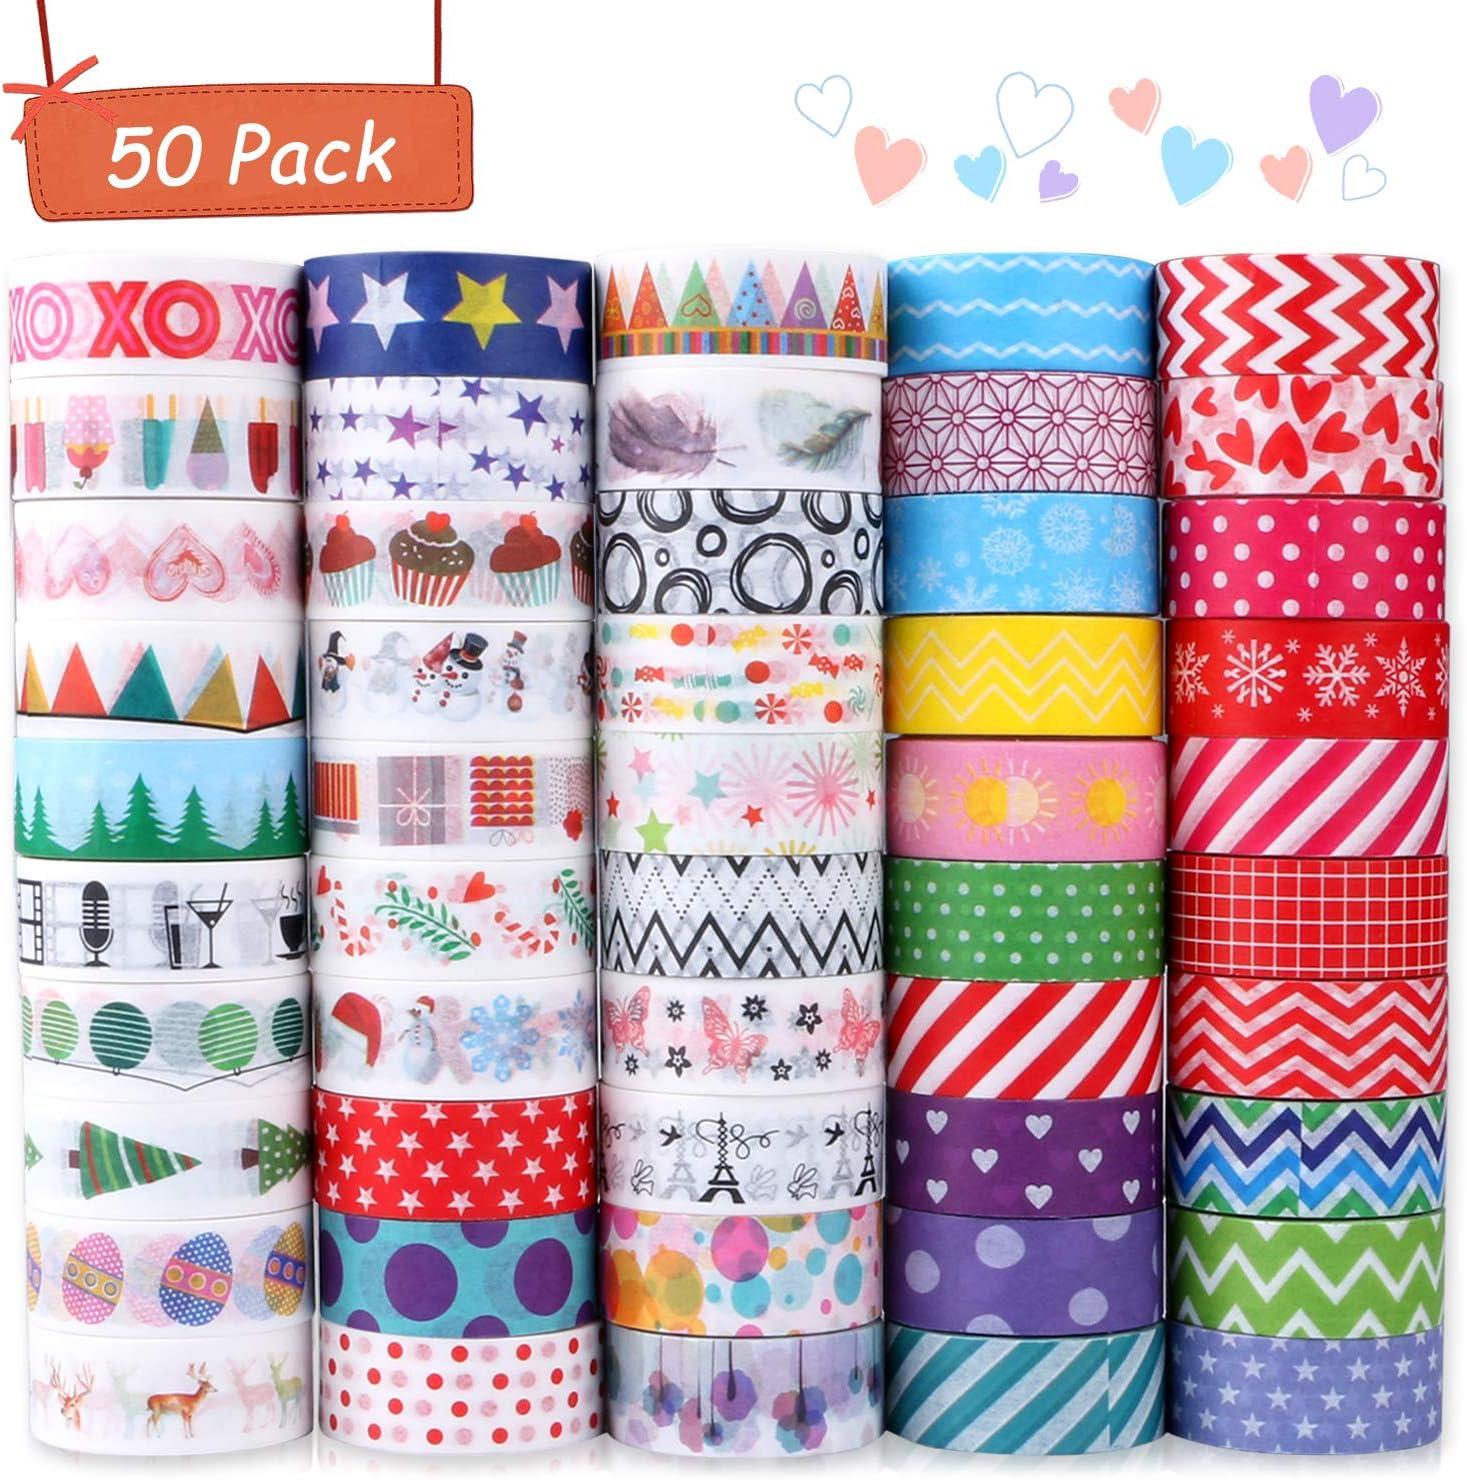 Buluri 50 Rollos de Cinta Adhesiava Washi Cinta Adhesiva Decorativa para Scrapbooking DIY Manualidades